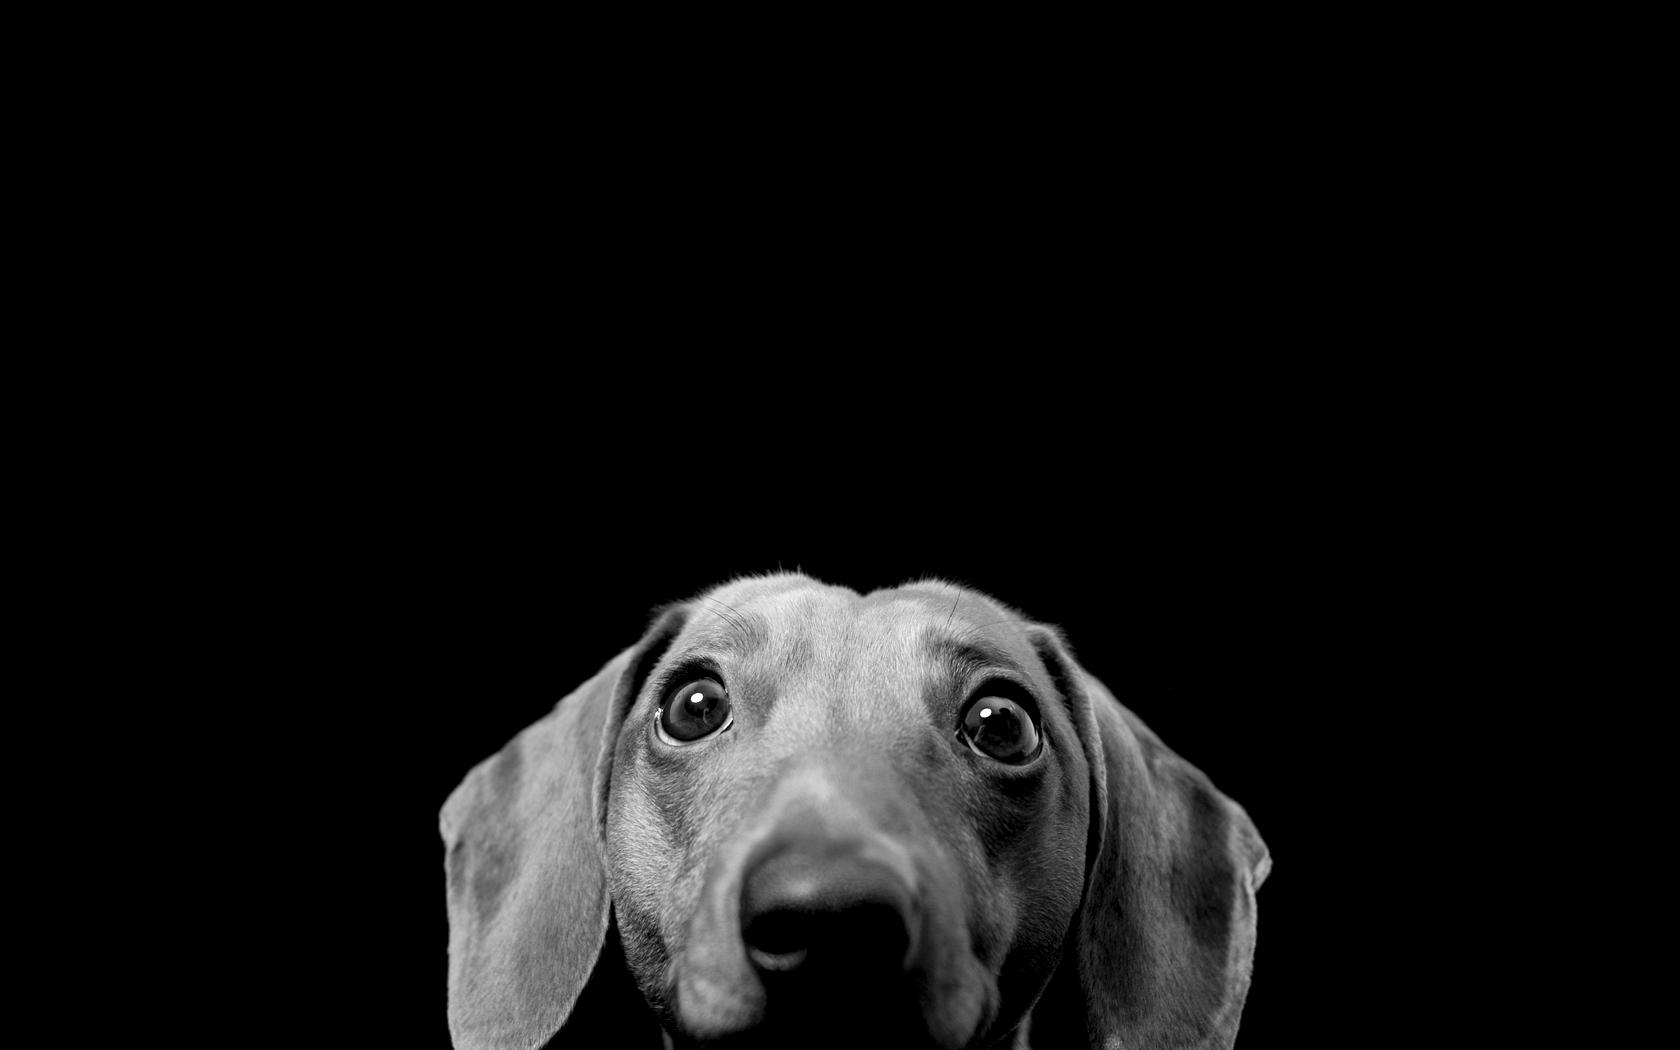 Dog Wallpaper 1680x1050 ID14604   WallpaperVortexcom 1680x1050